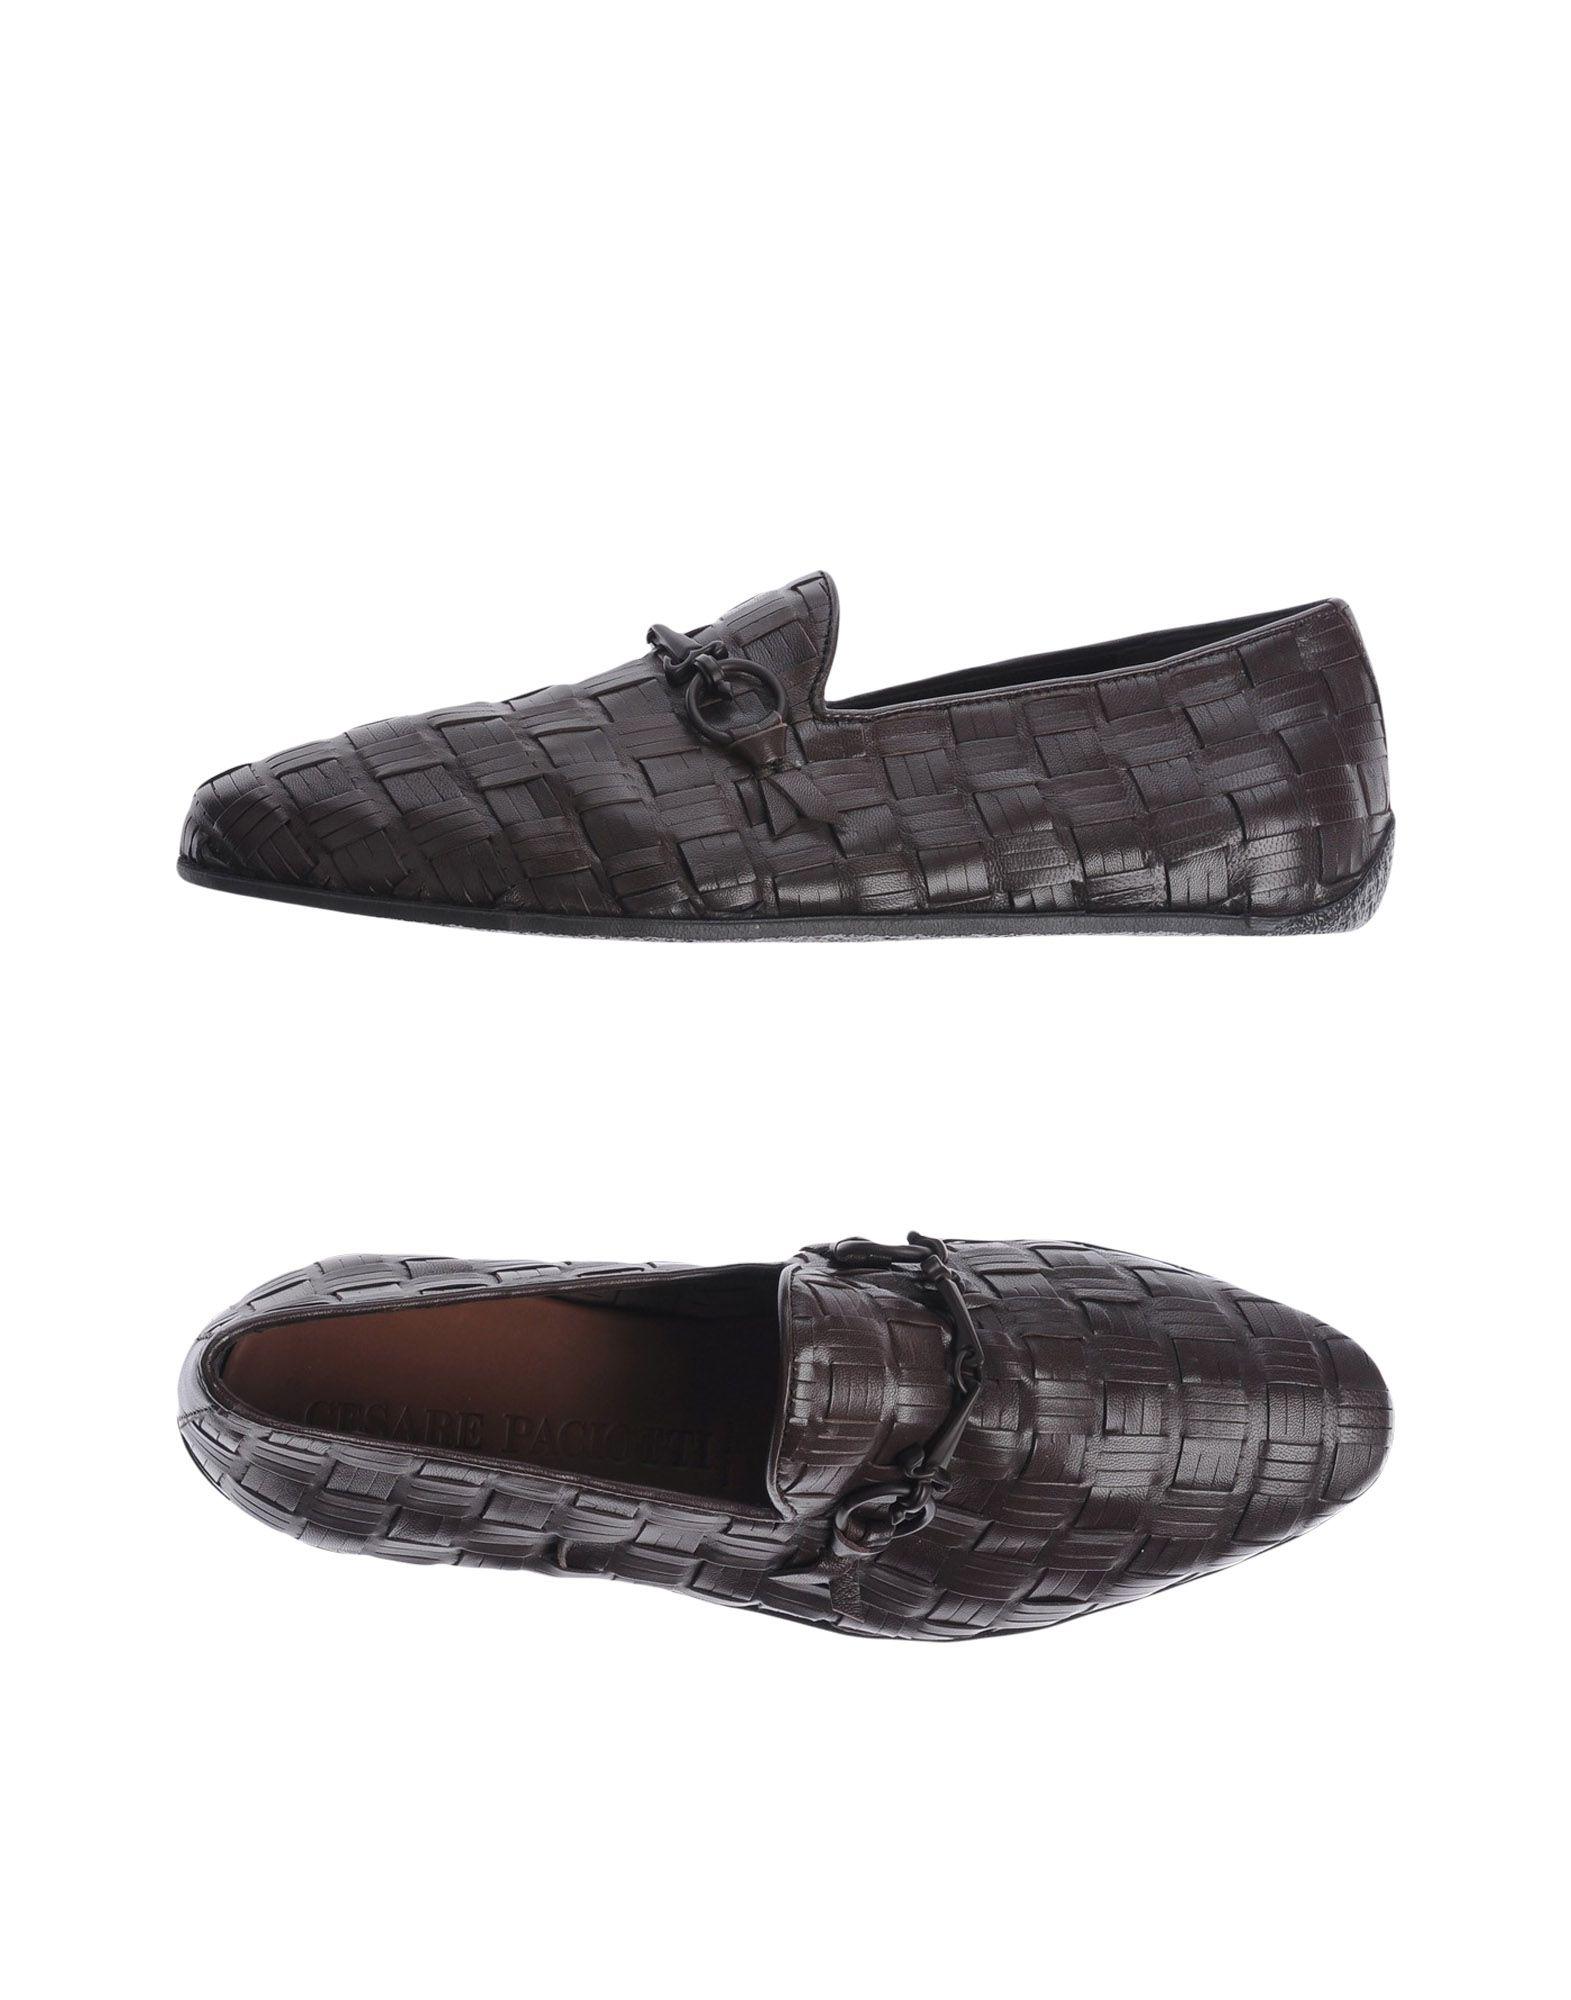 Cesare Paciotti Gute Mokassins Herren  11169075SF Gute Paciotti Qualität beliebte Schuhe 7f11fe